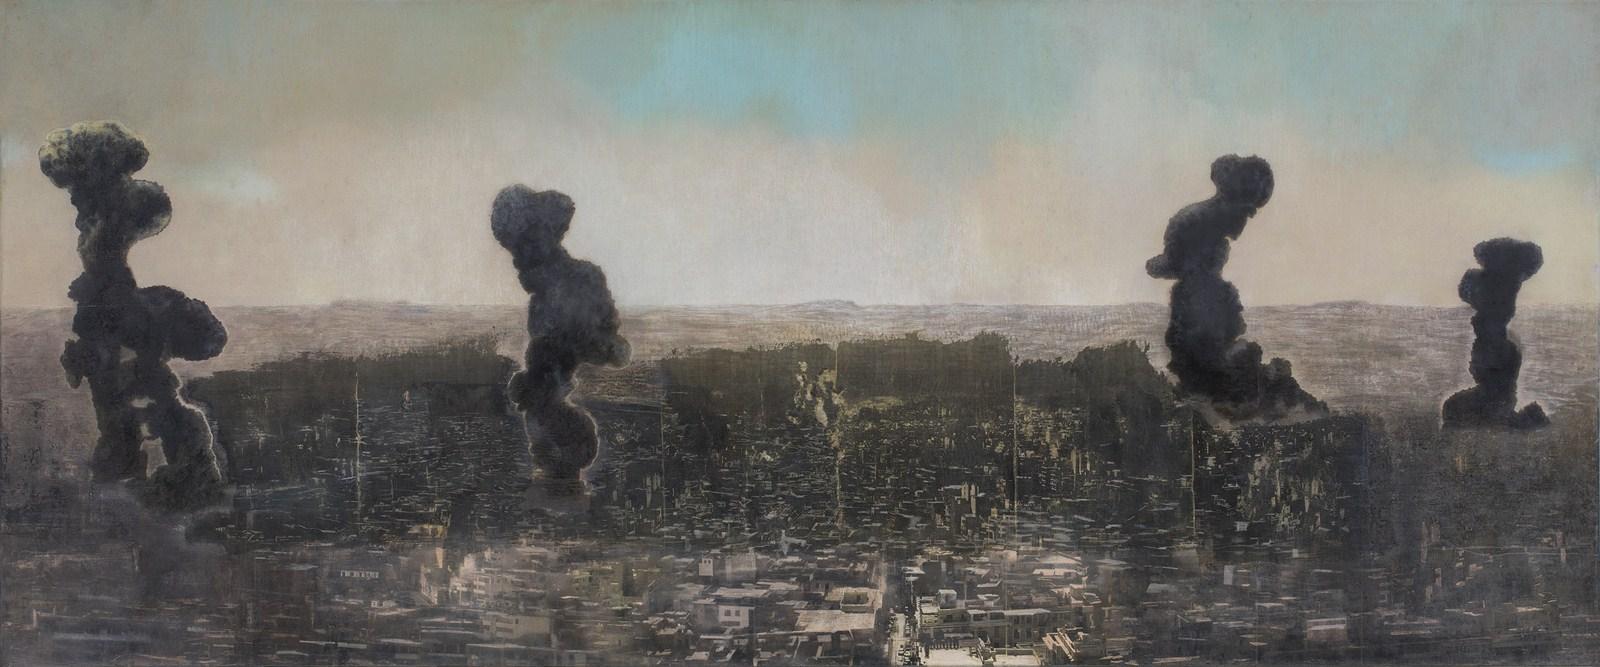 "Aleppo | Mixed media, oil on canvas | 30"" x 72"" | 2017 – 2018"